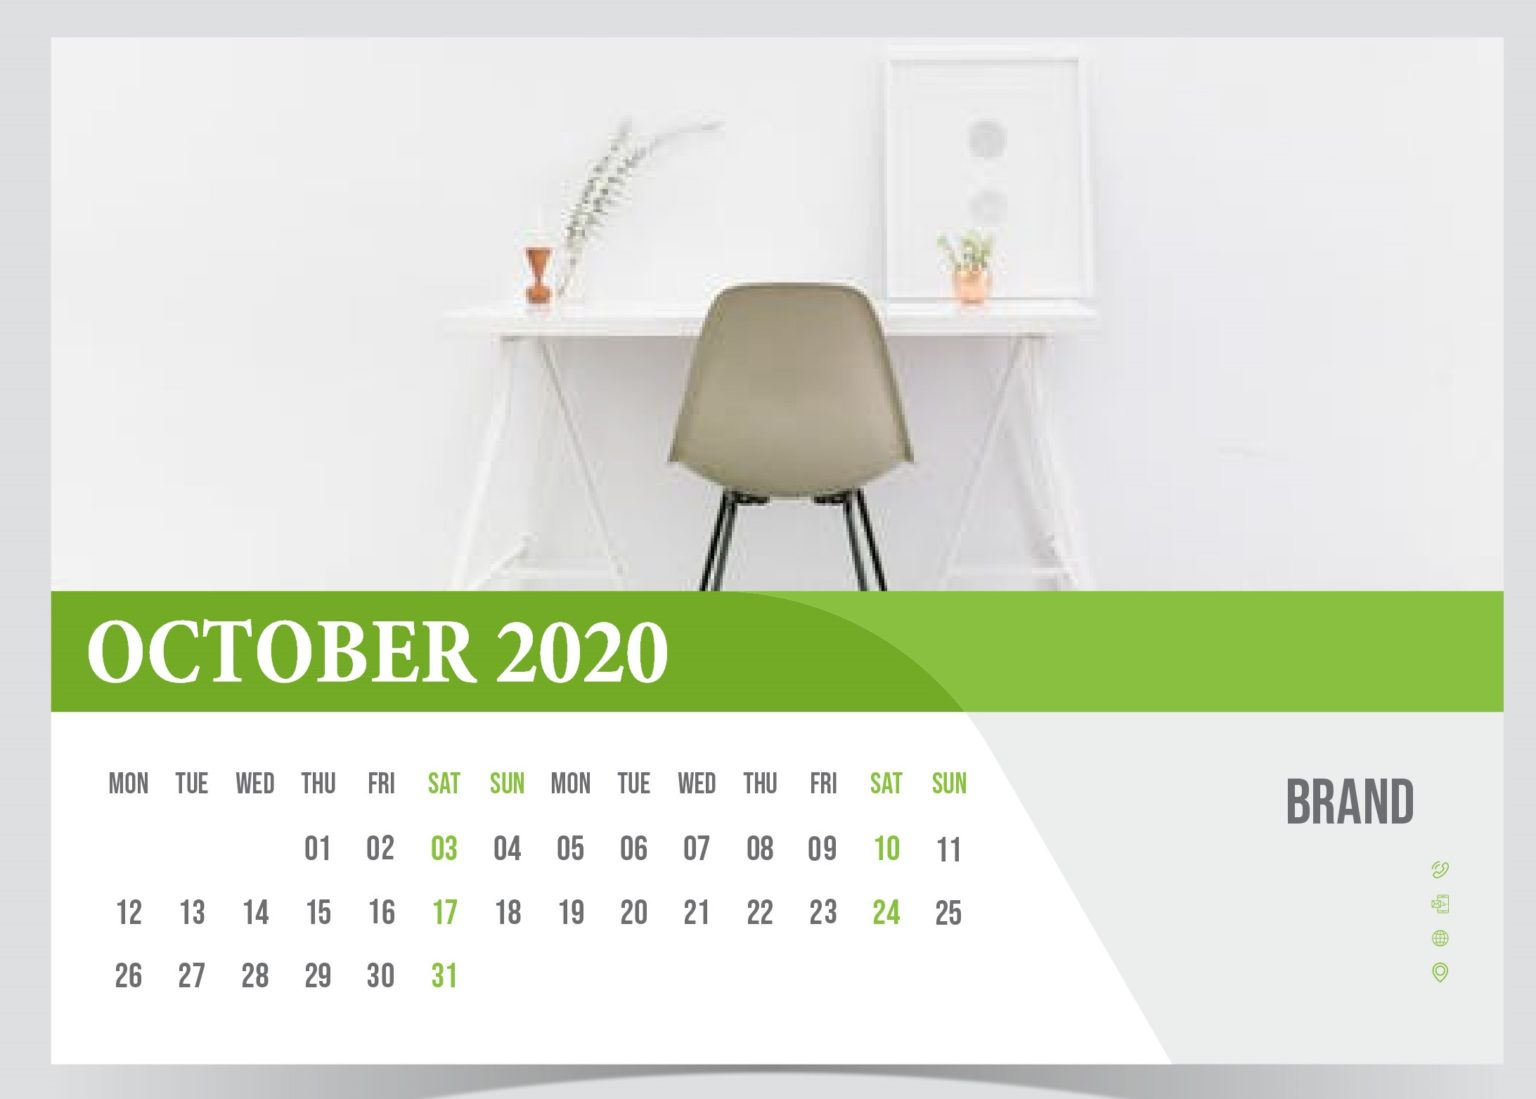 Latest October 2020 Desk Calendar